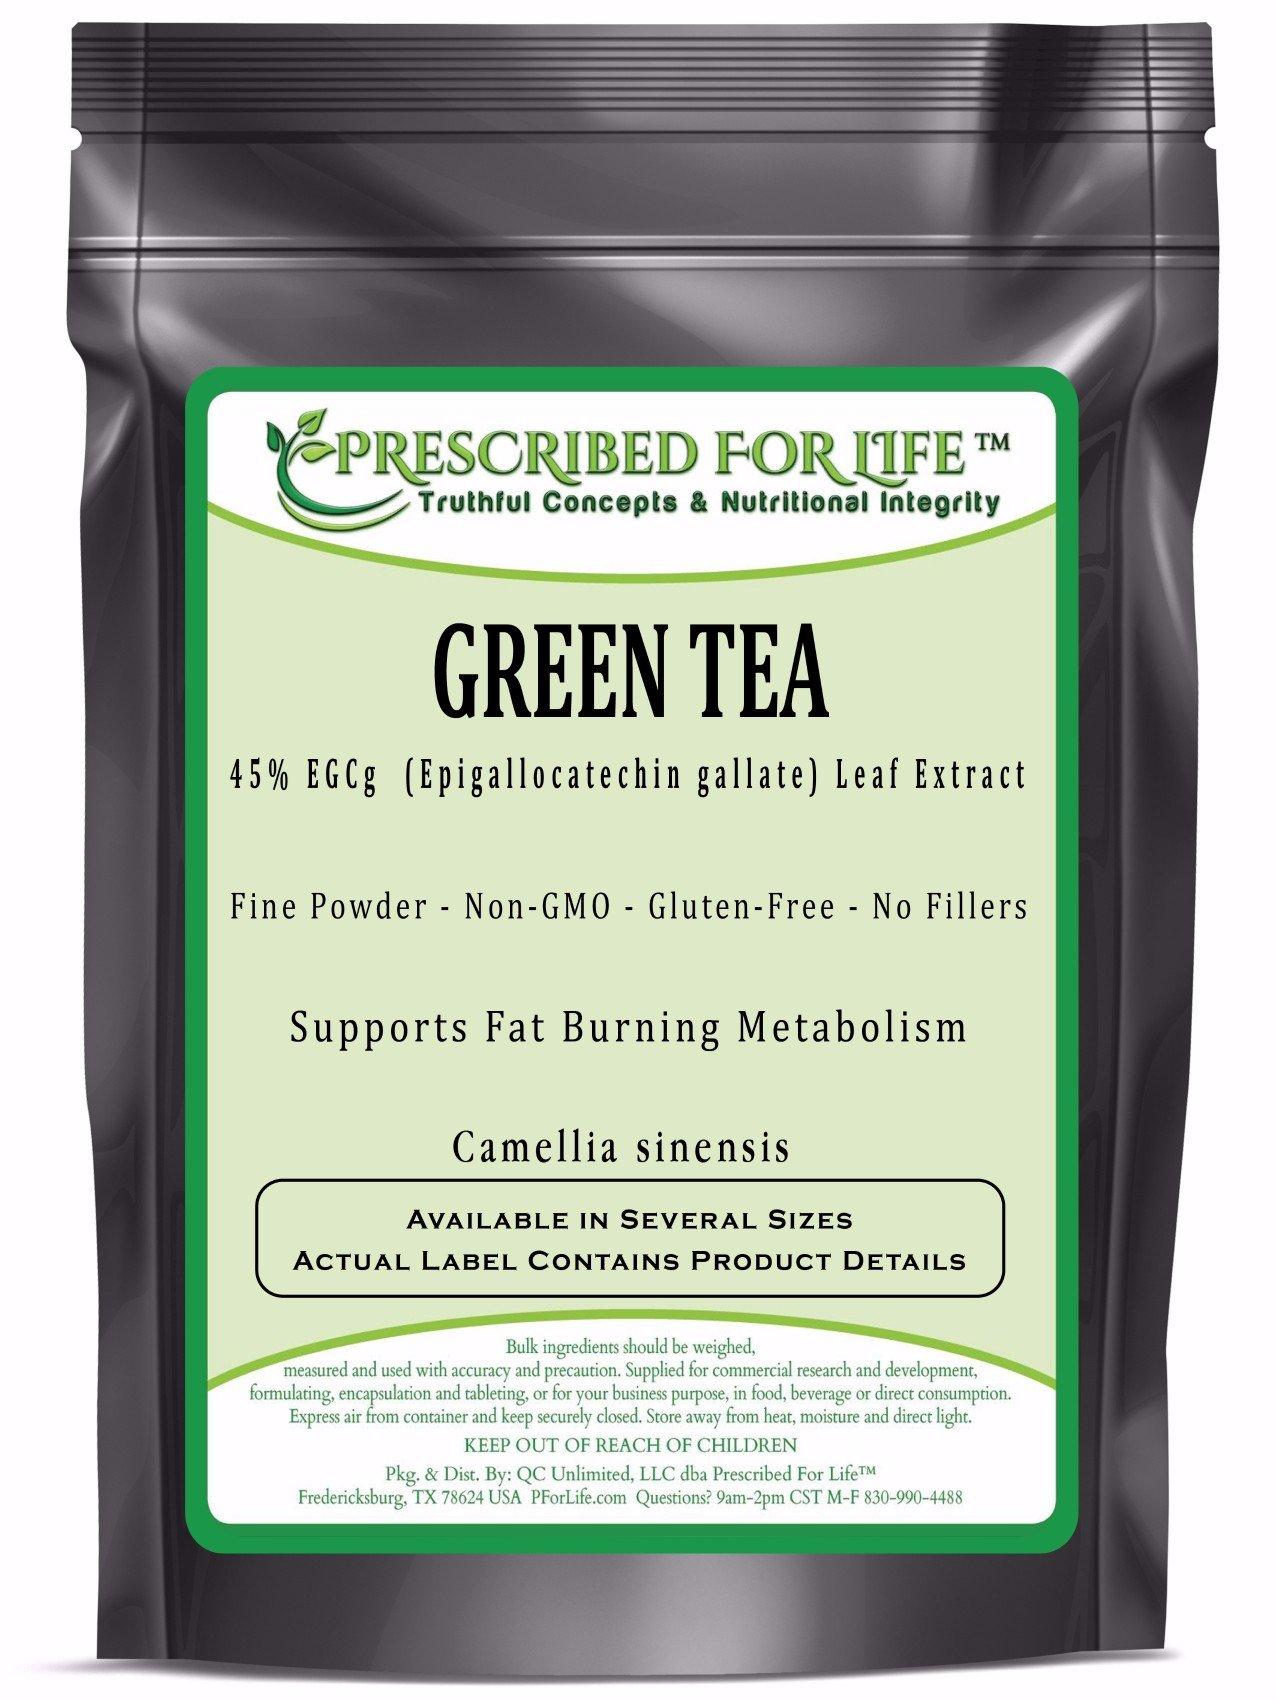 Green Tea - 45% EGCg (Epigallocatechin gallate) Natural Leaf Extract Powder (Camellia sinensis), 55 lb